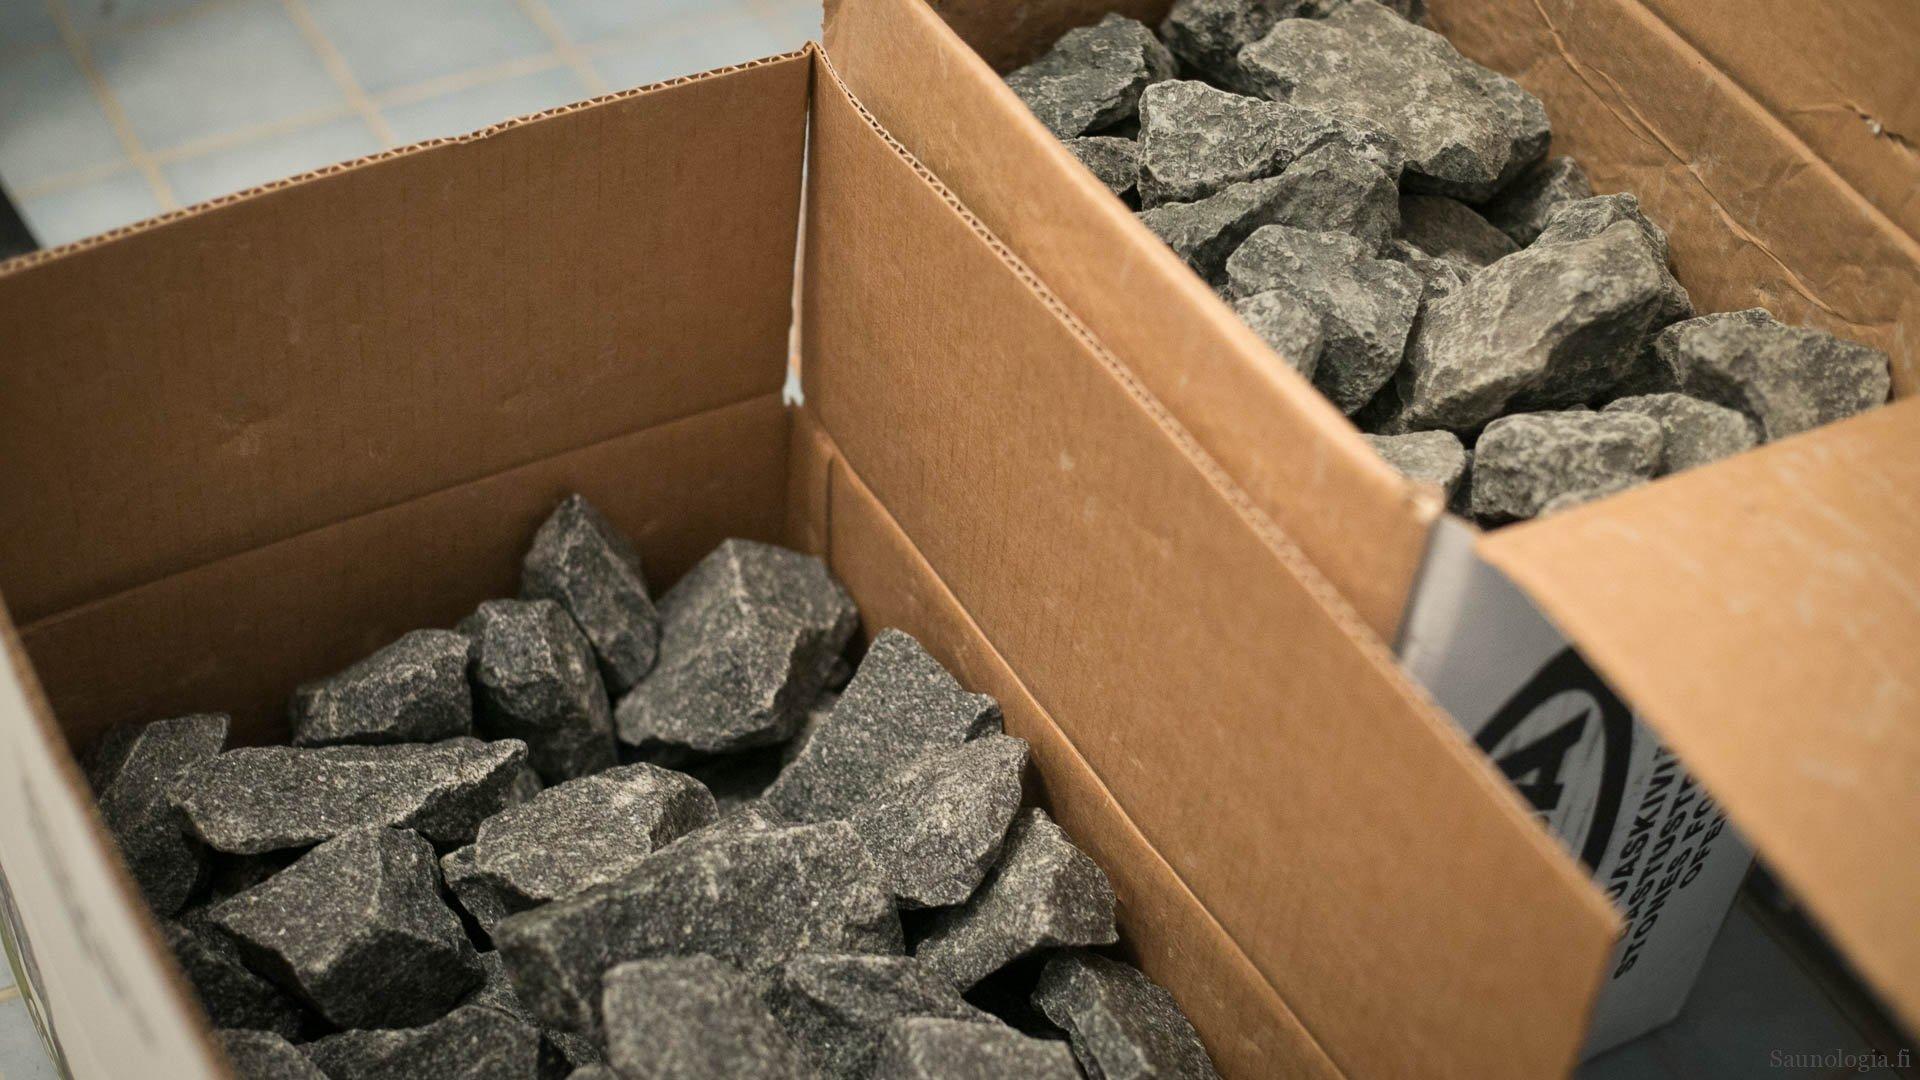 180109-kivienvaihto-pieni-kivilootat